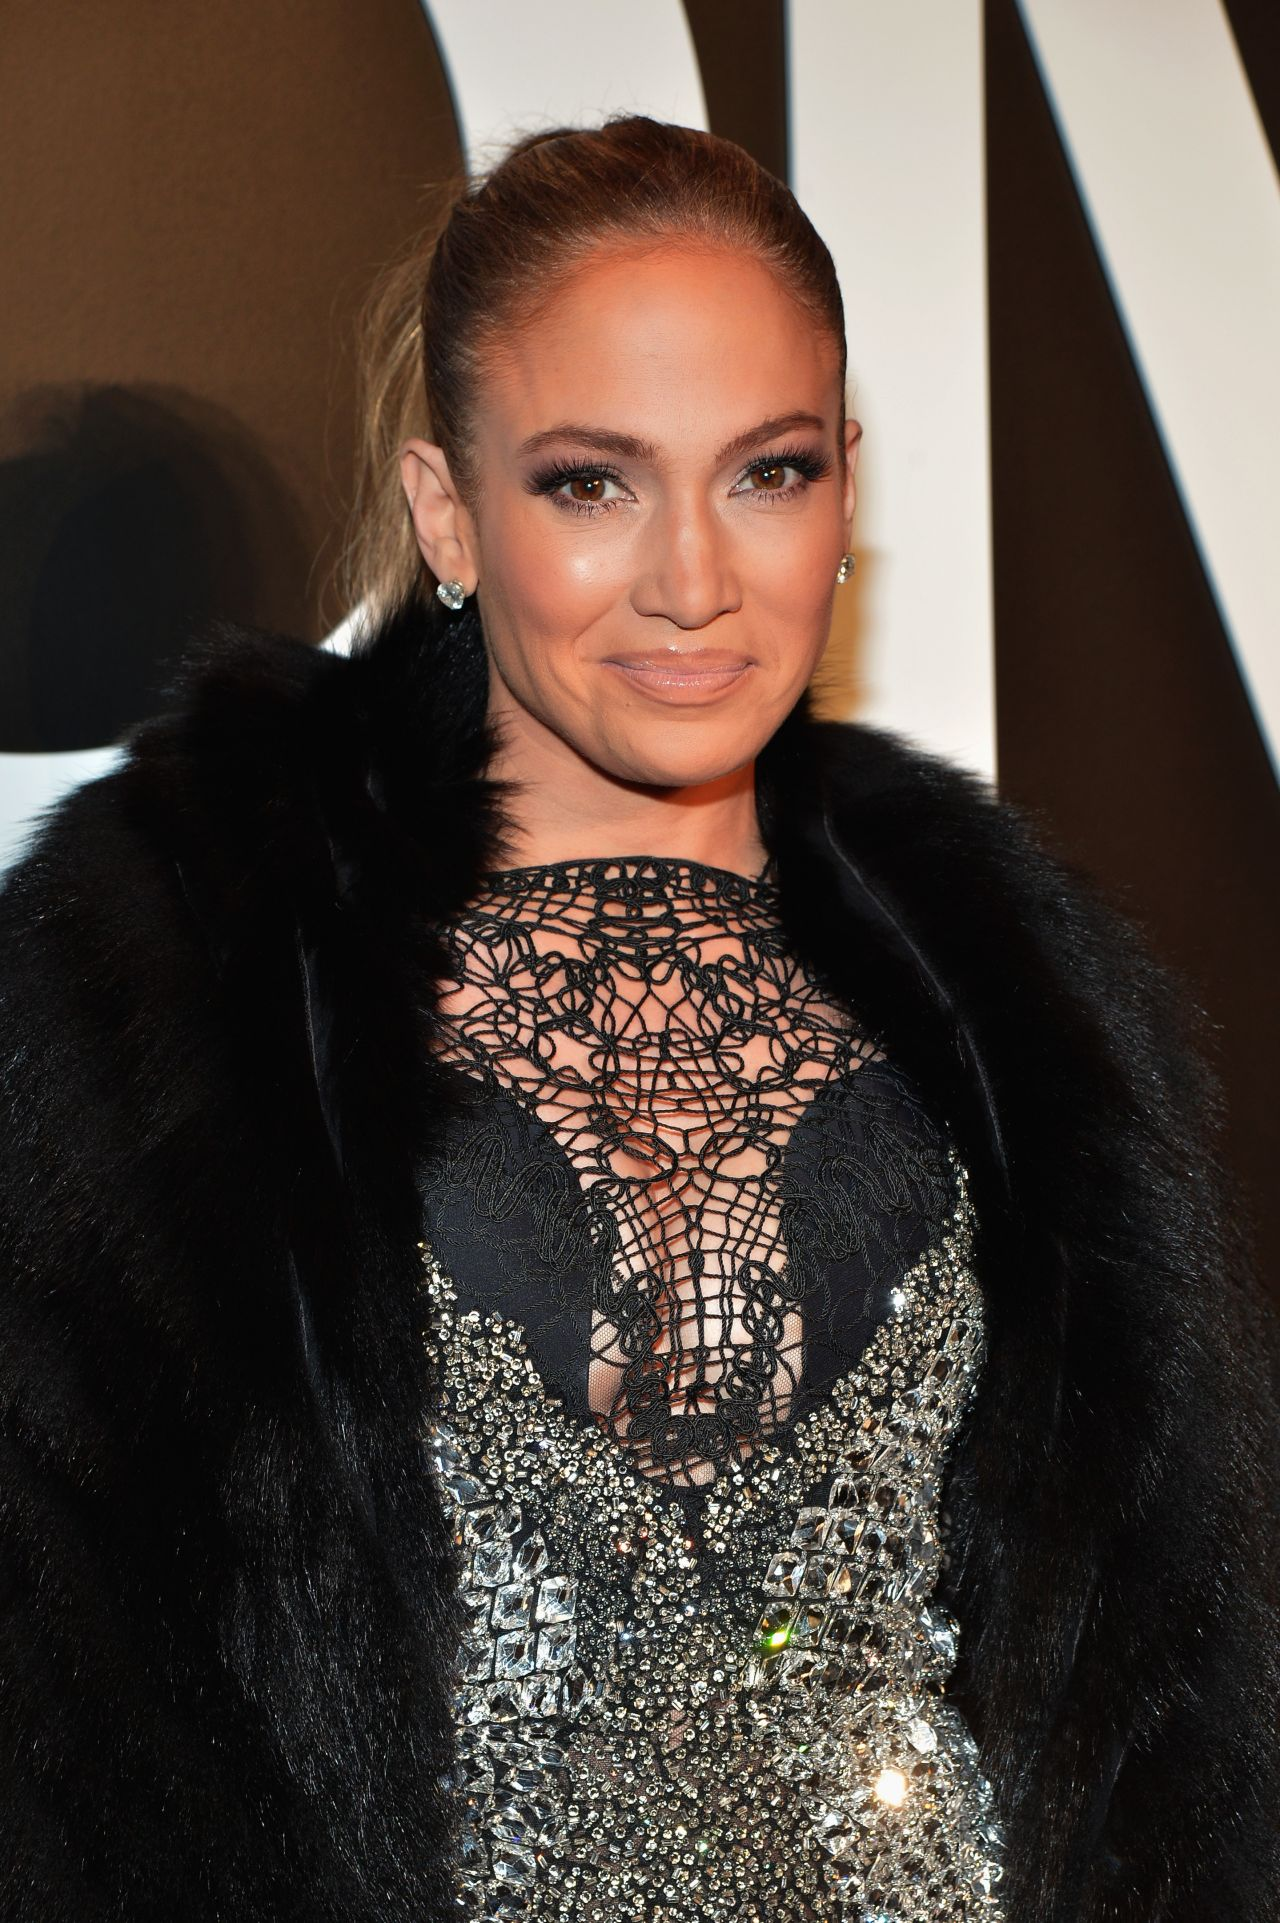 Jennifer Lopez – Tom Ford Autumn/Winter 2015 Womenswear Collection Presentation in Los Angeles